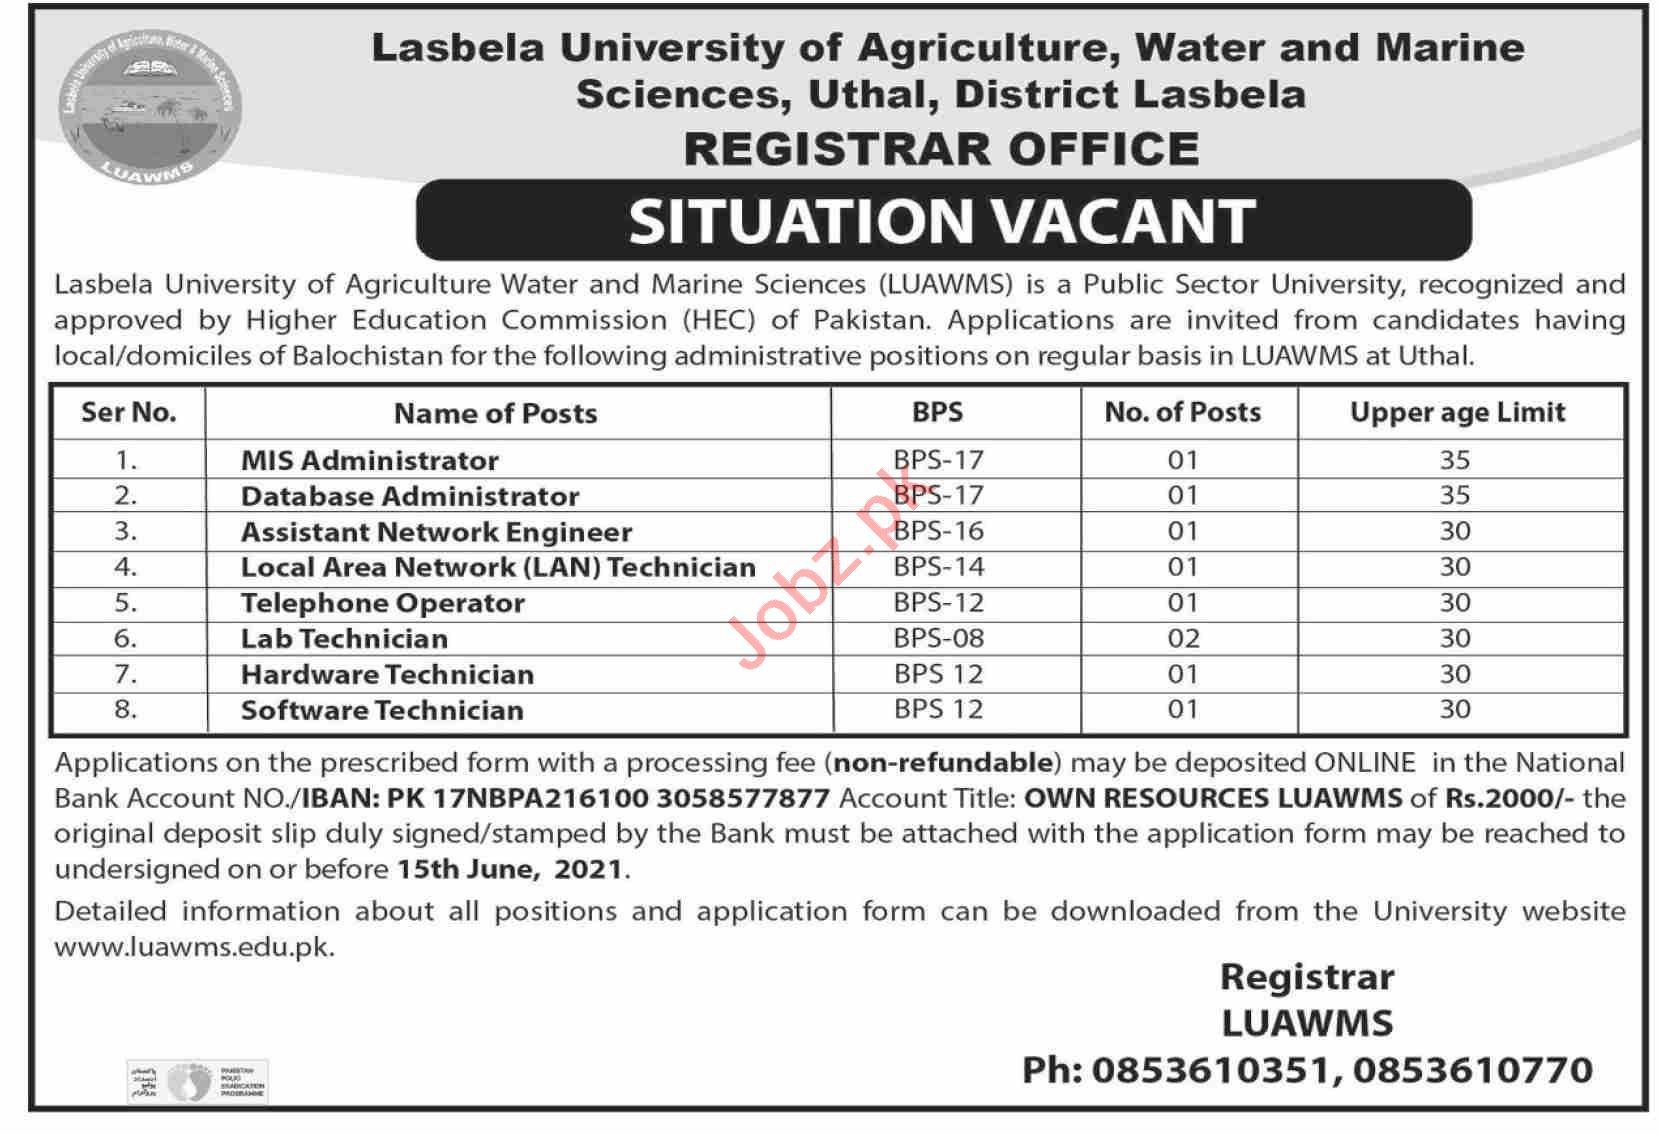 Lasbela University of Agriculture Water & Marine Jobs 2021